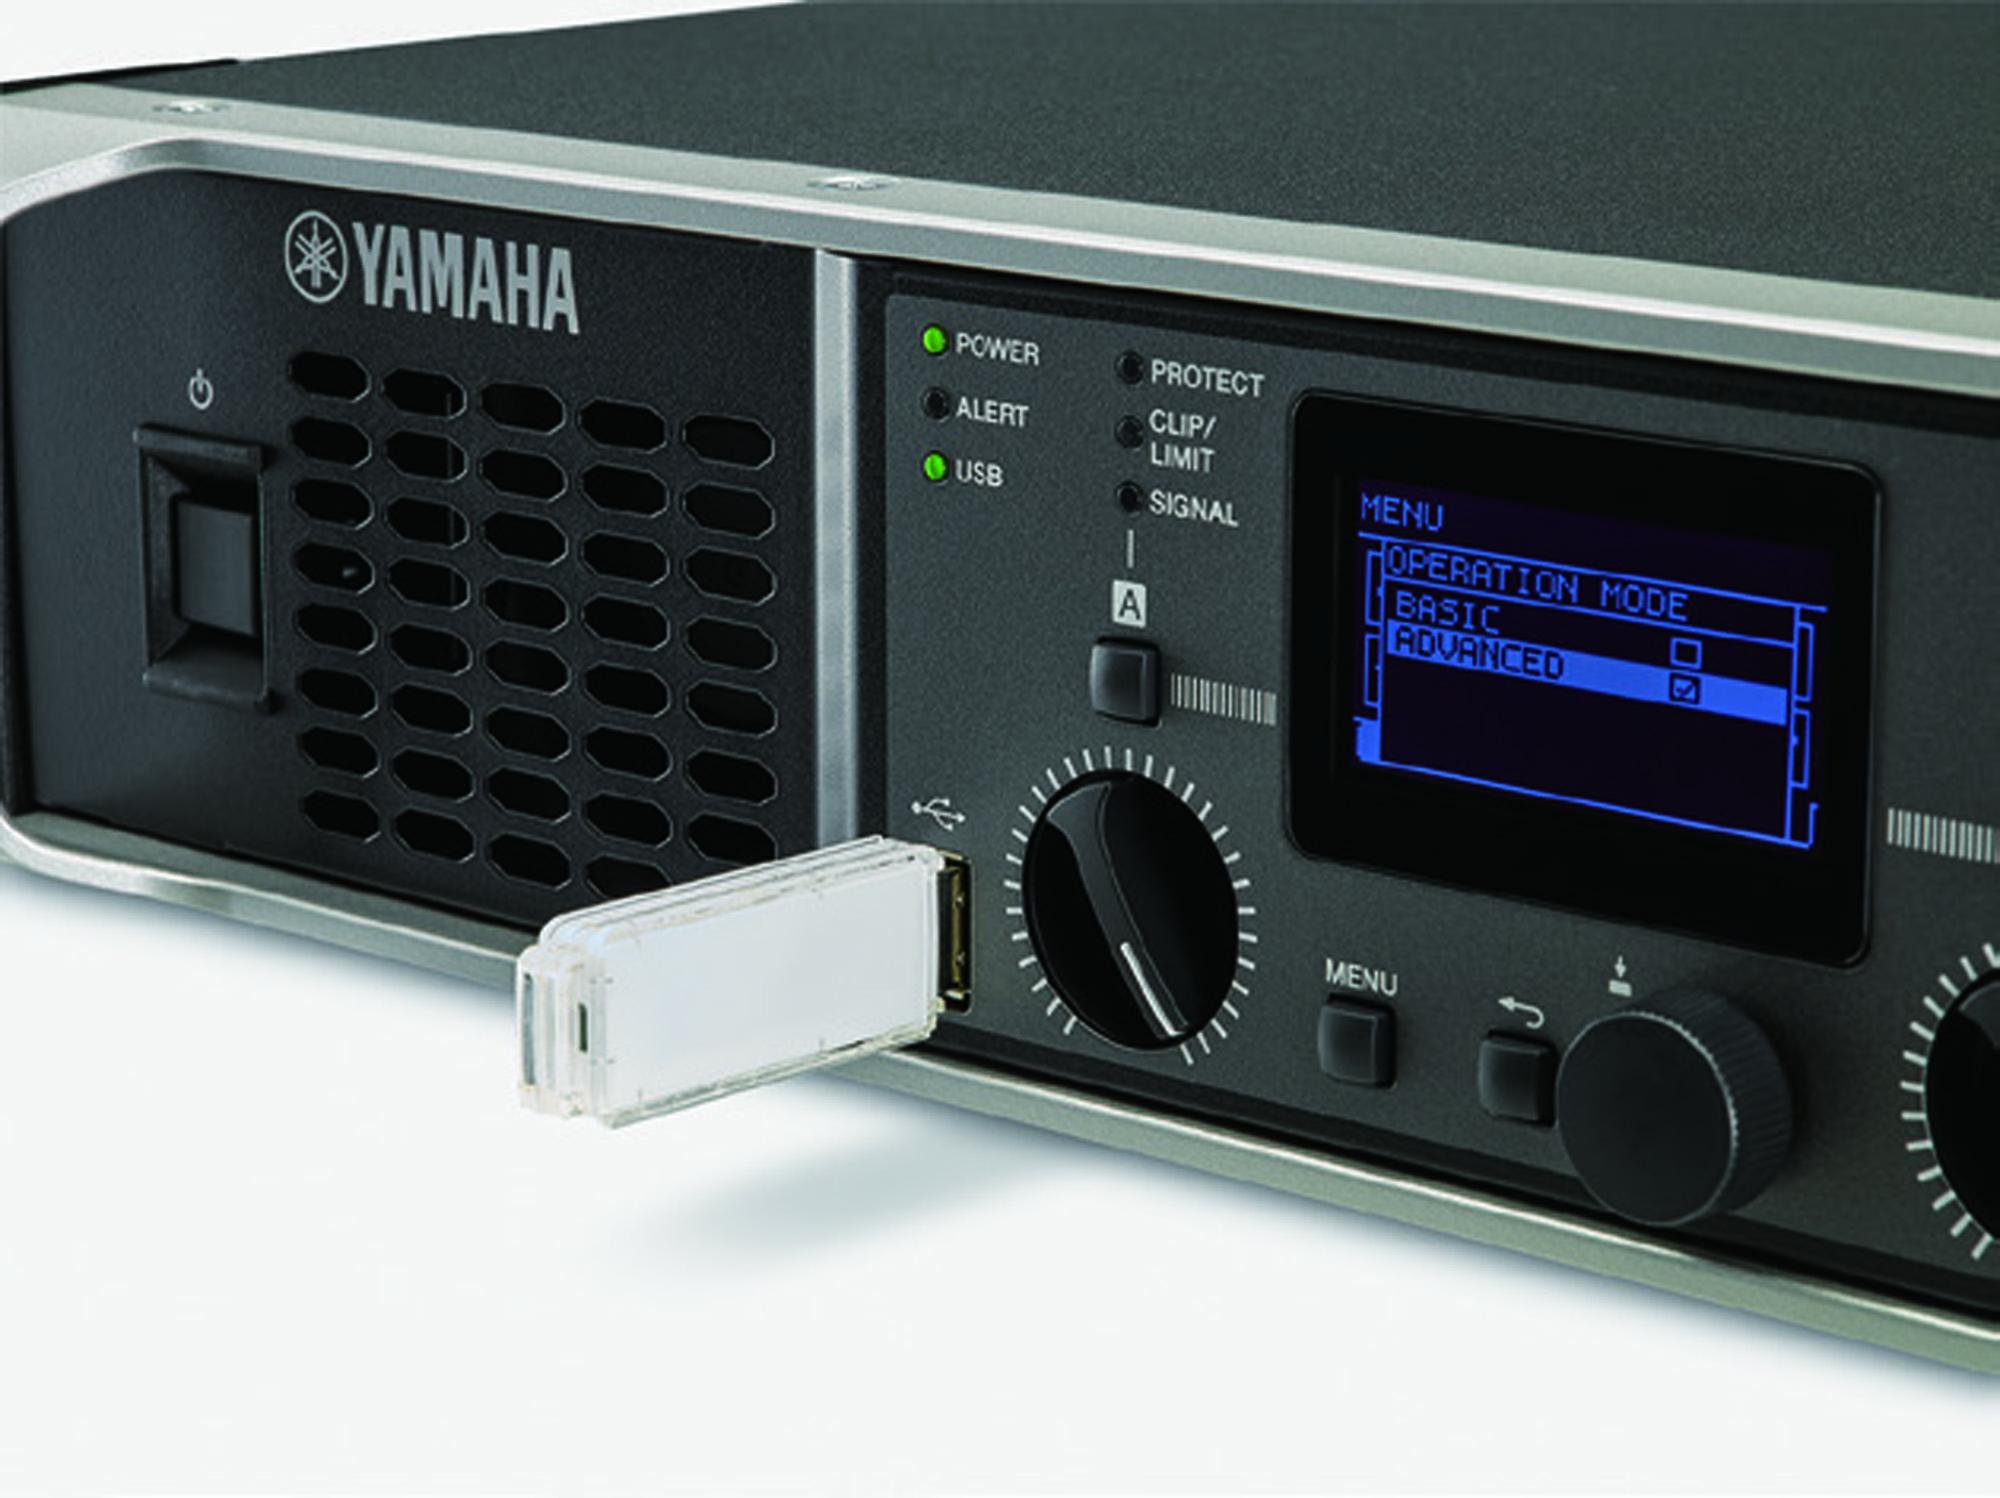 yamaha px5 power amplifier 500w stereo power amp yamaha